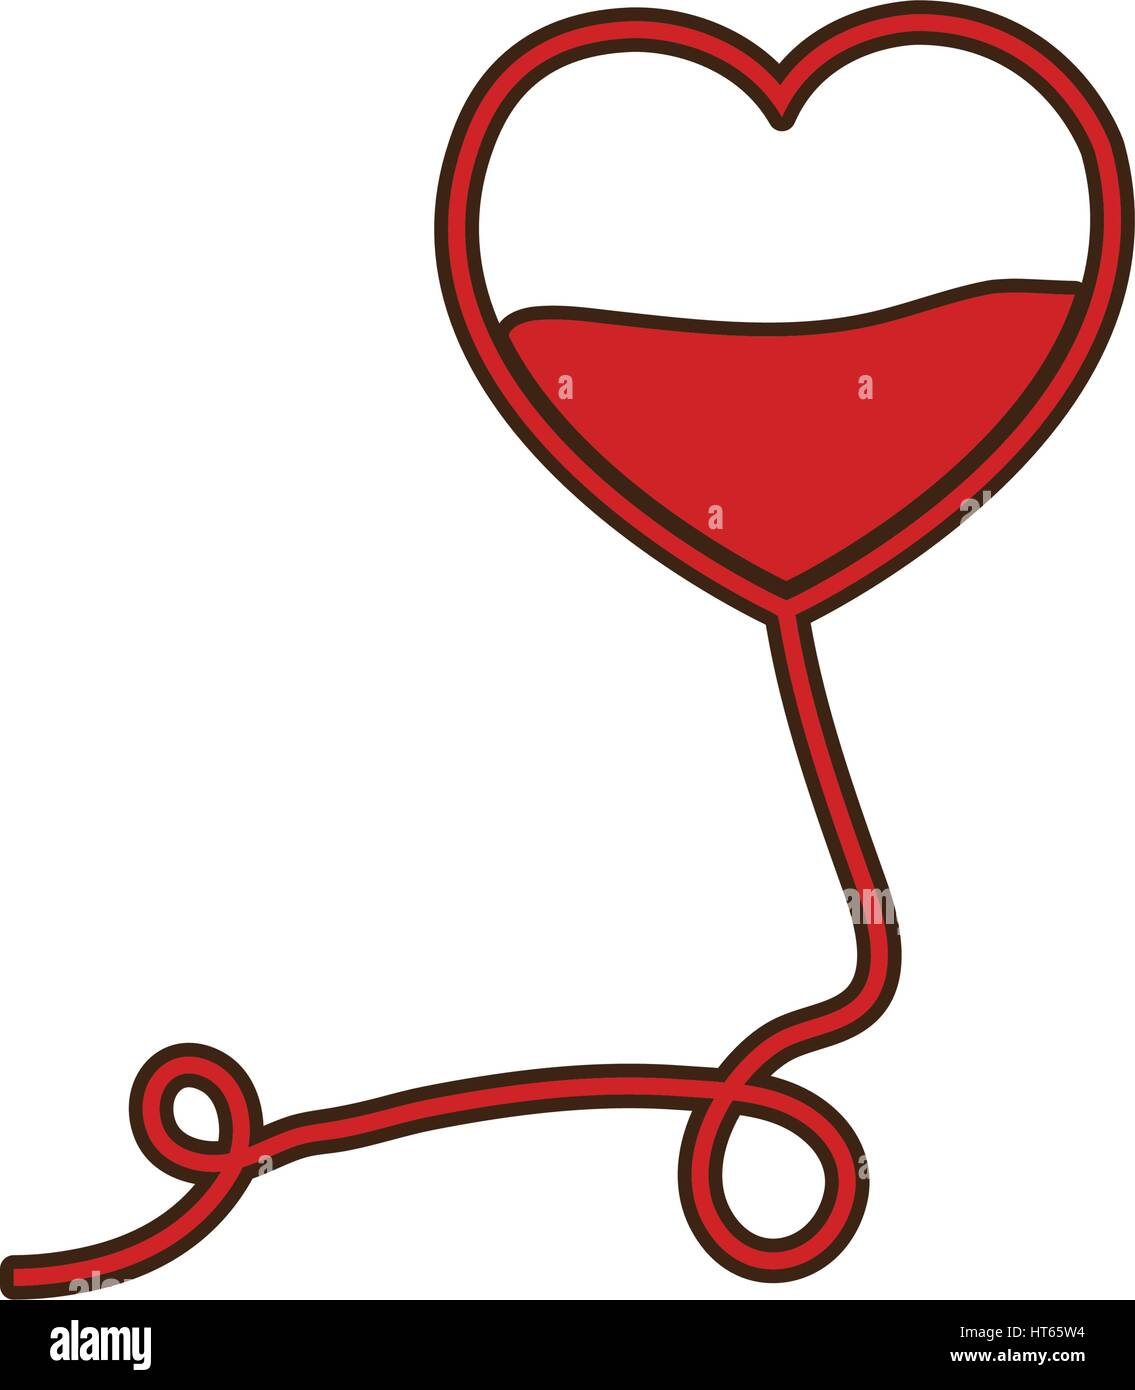 Blood donation heart symbol stock vector art illustration blood donation heart symbol buycottarizona